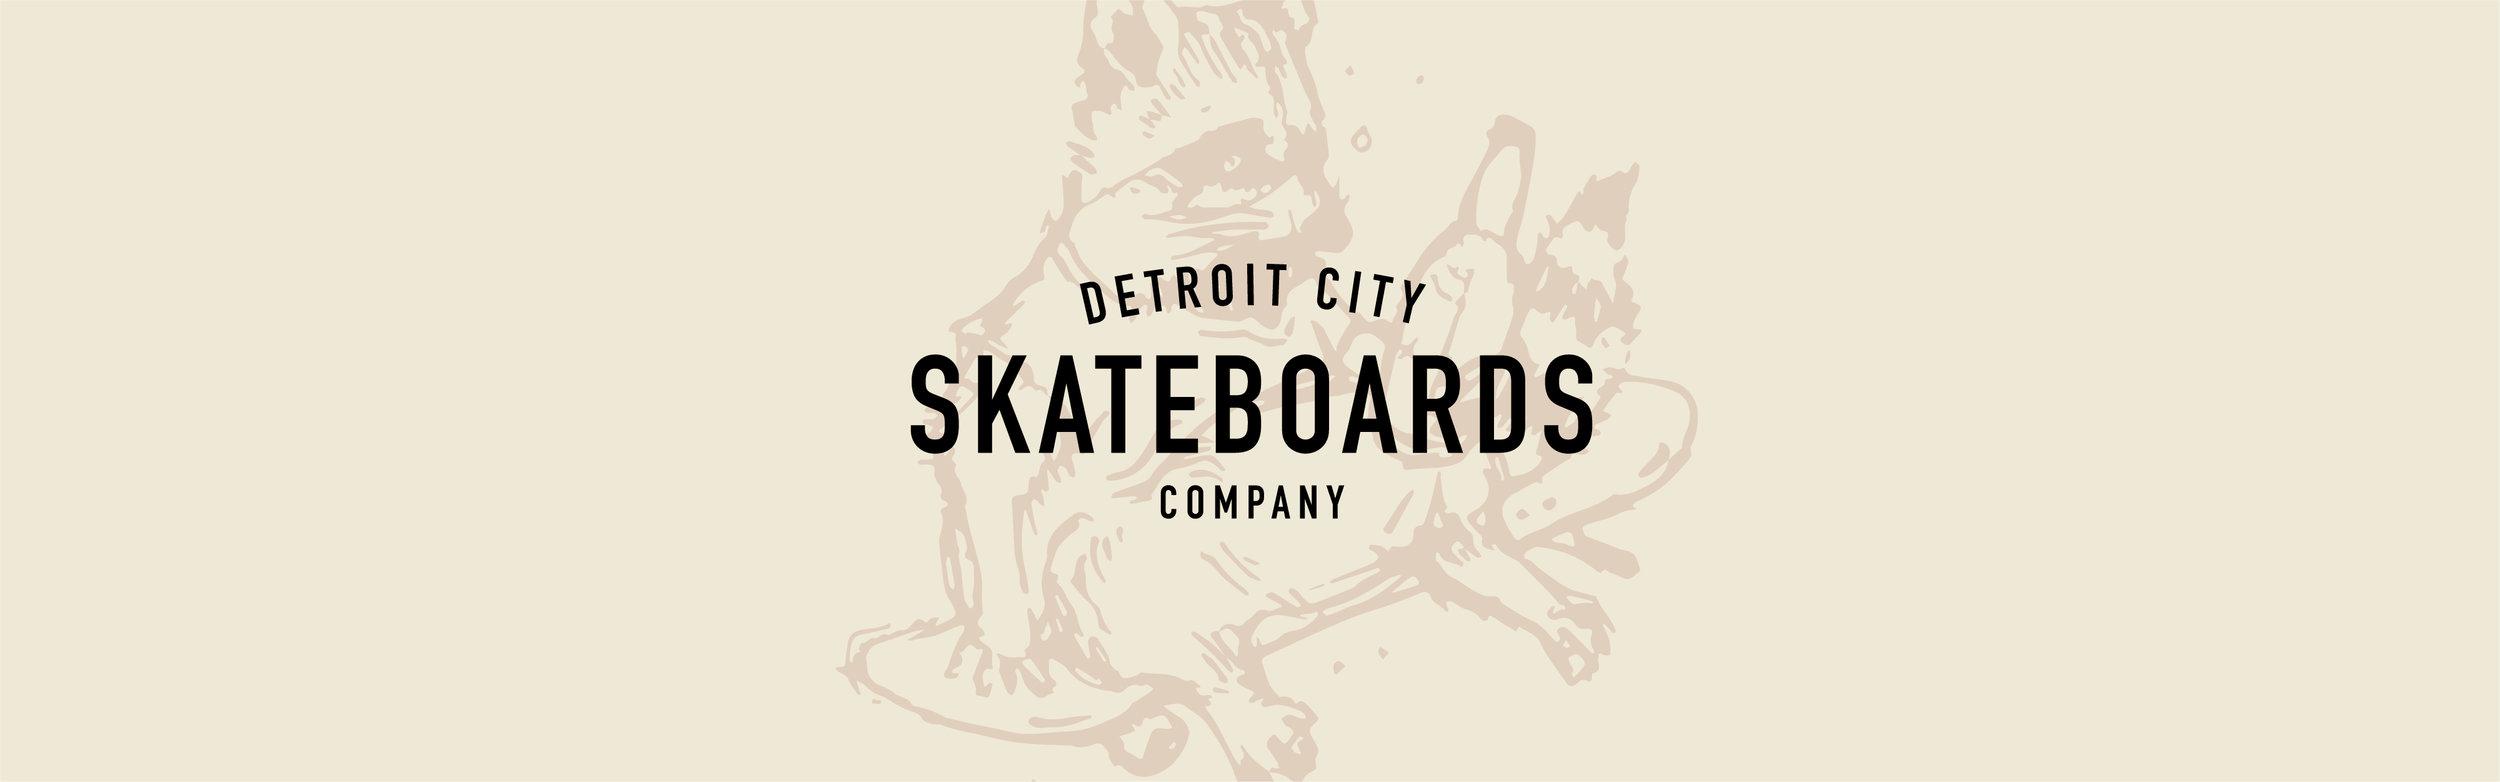 Detroit City Skateboards case study-02.jpg